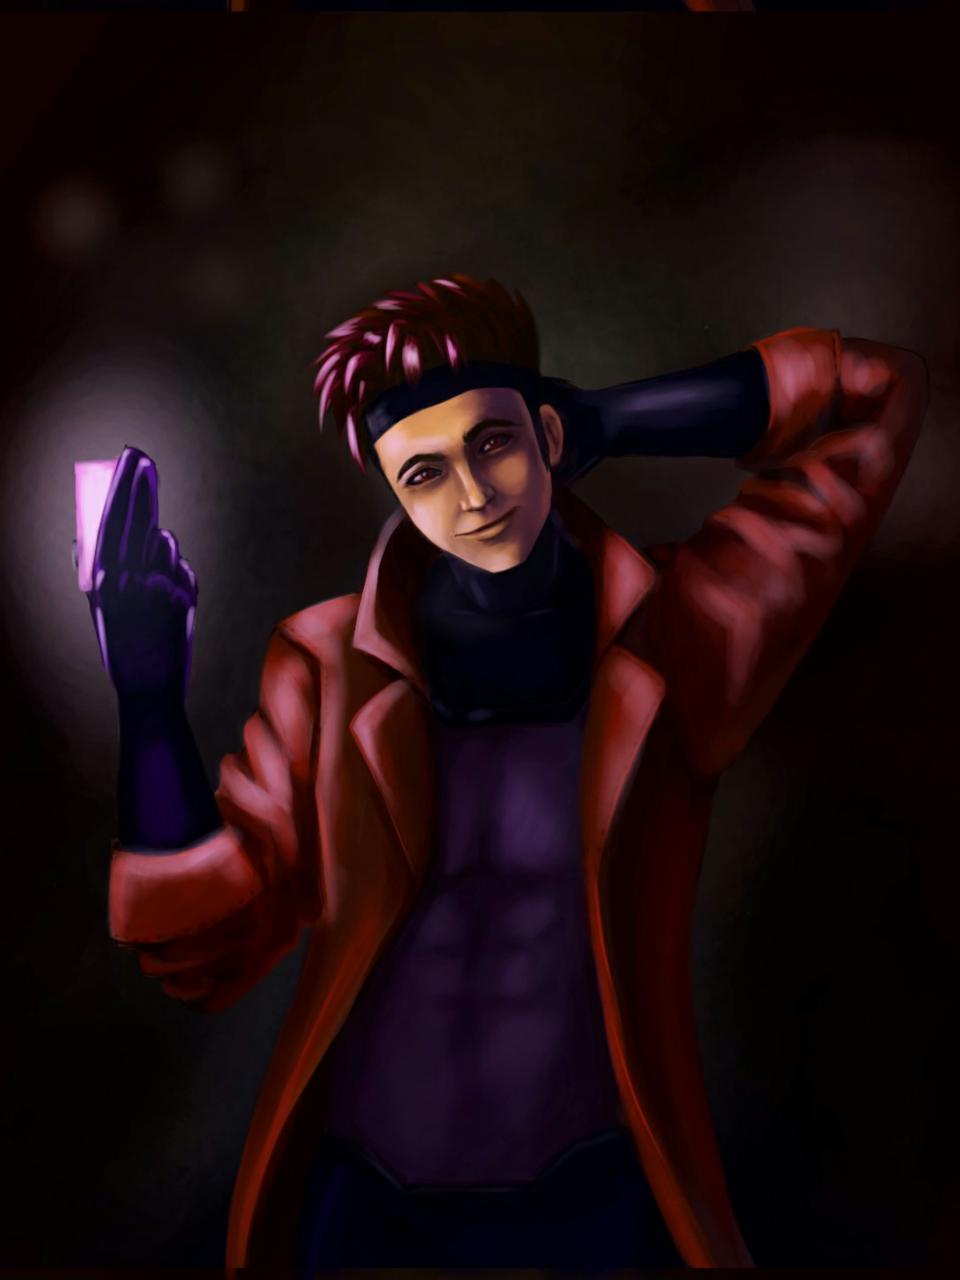 gsmbit Illust of Lema-lisa medibangpaint Xmen fanart gambit